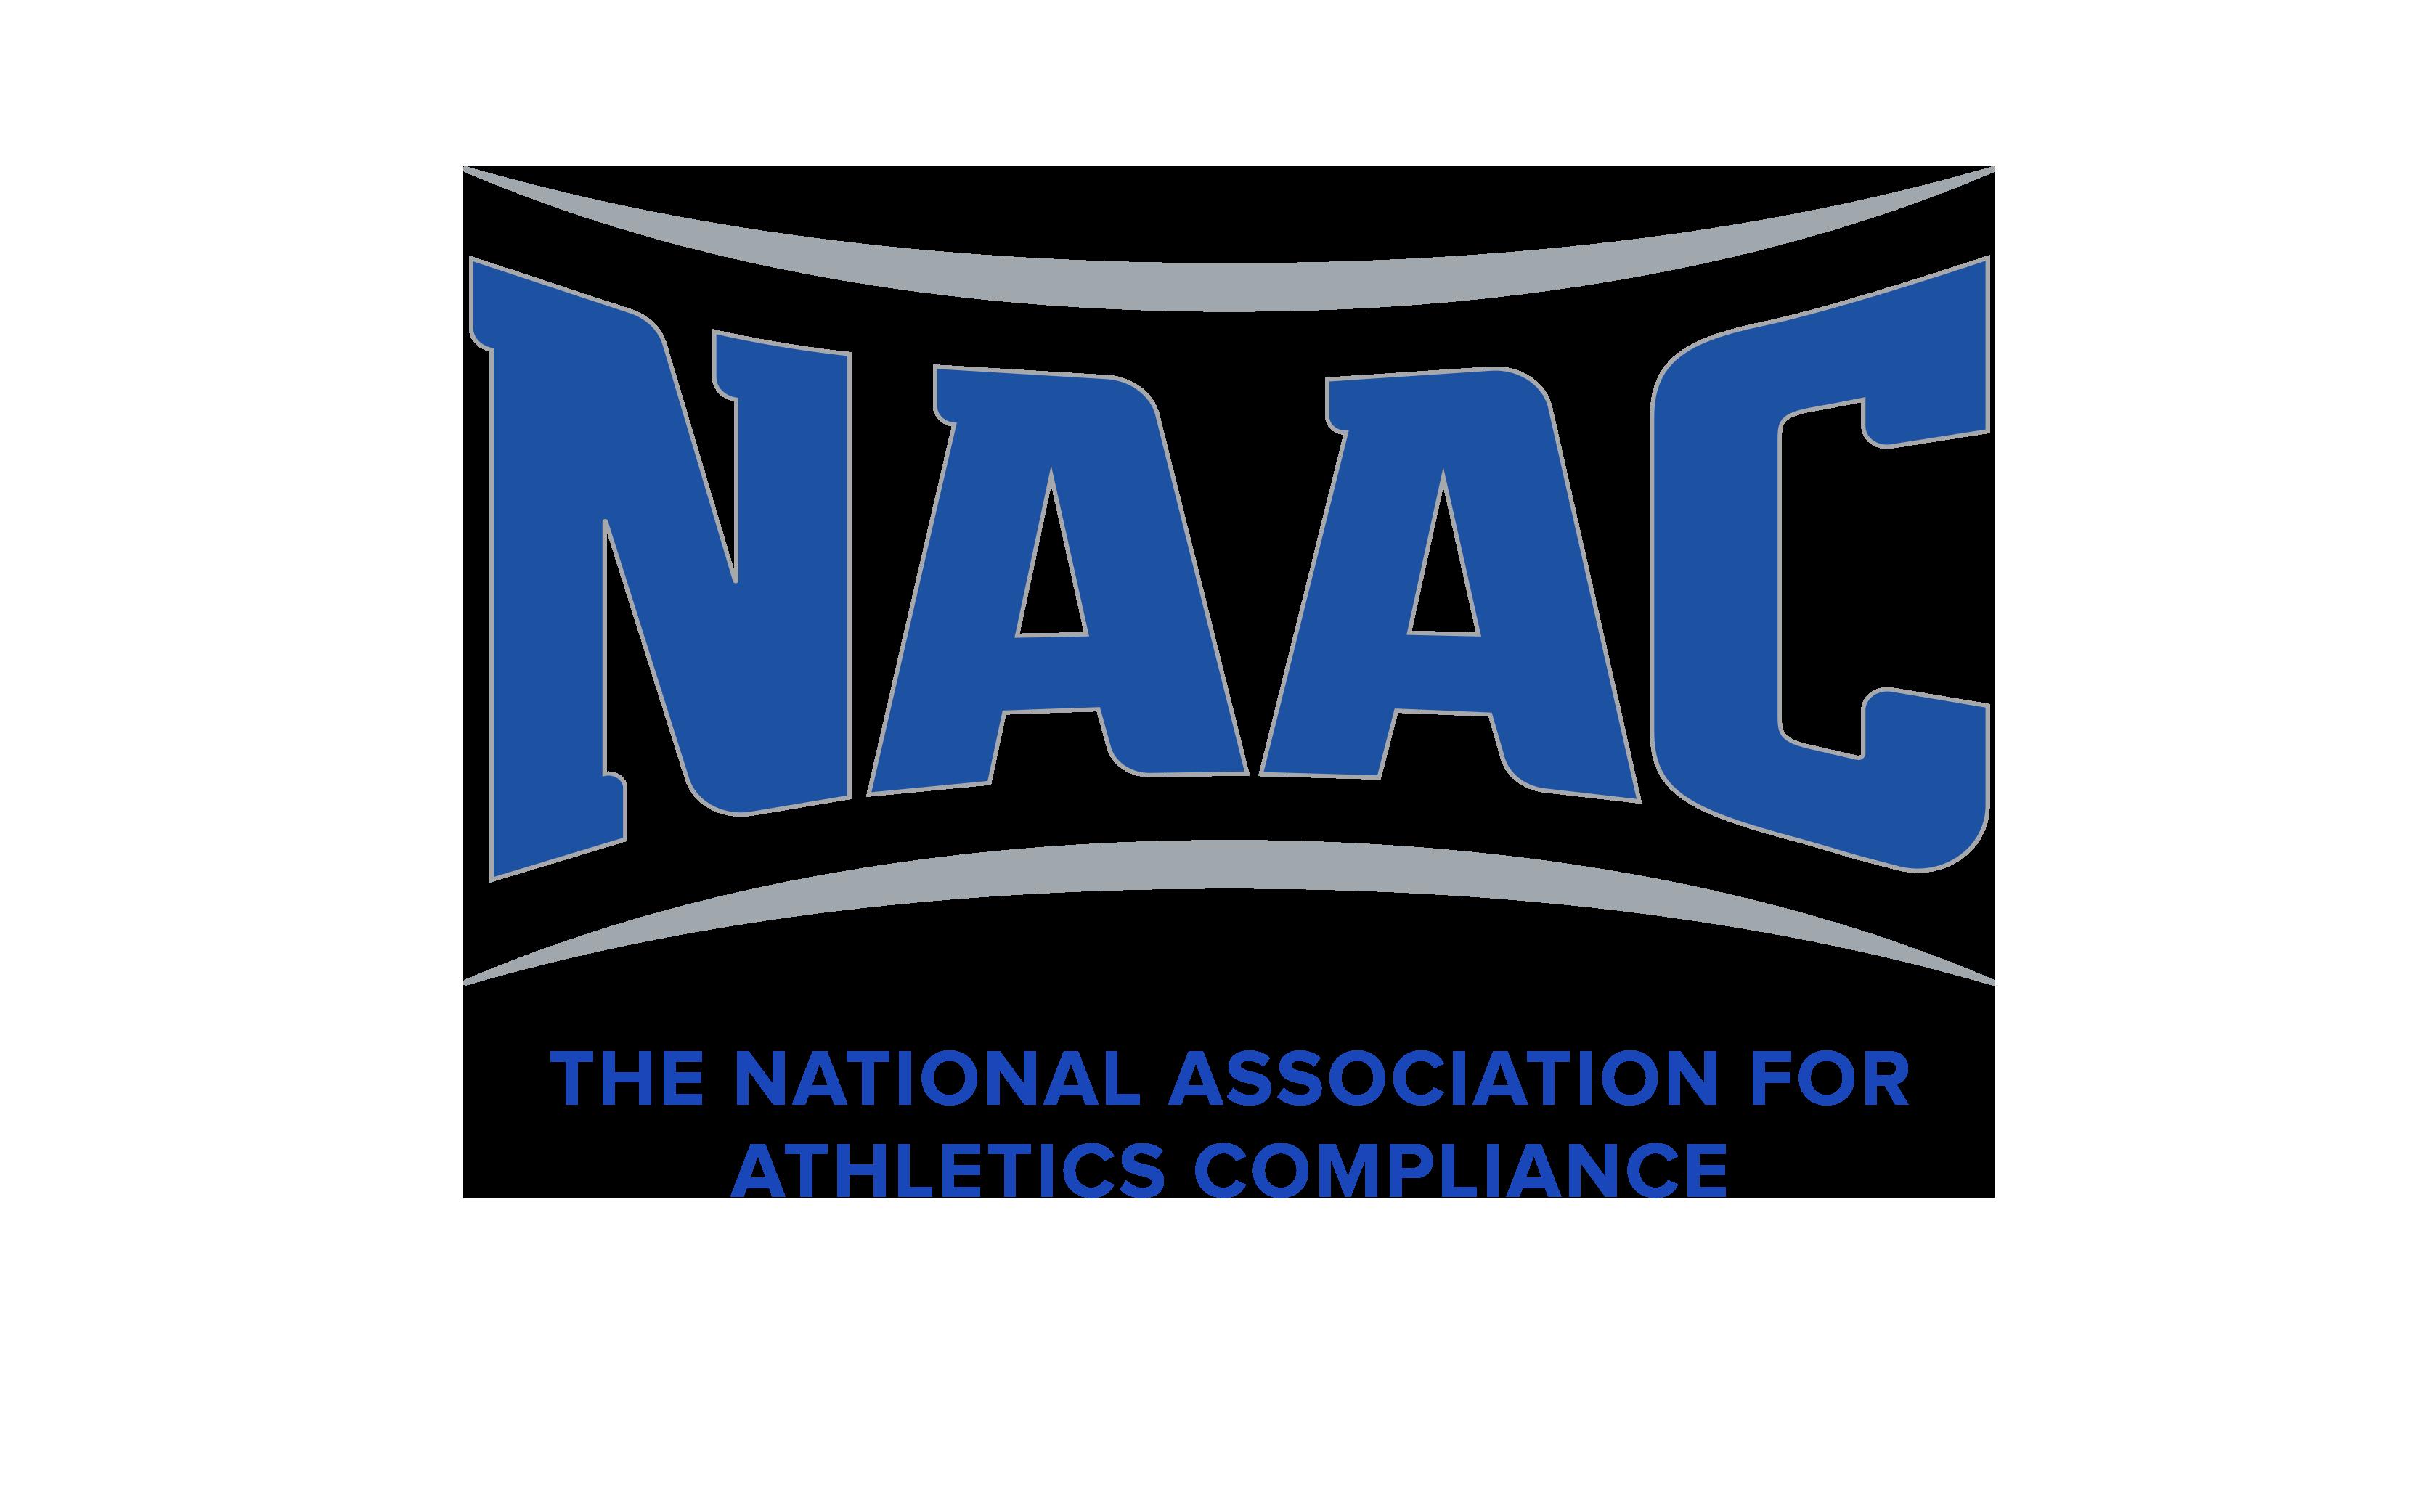 NAACCompliance